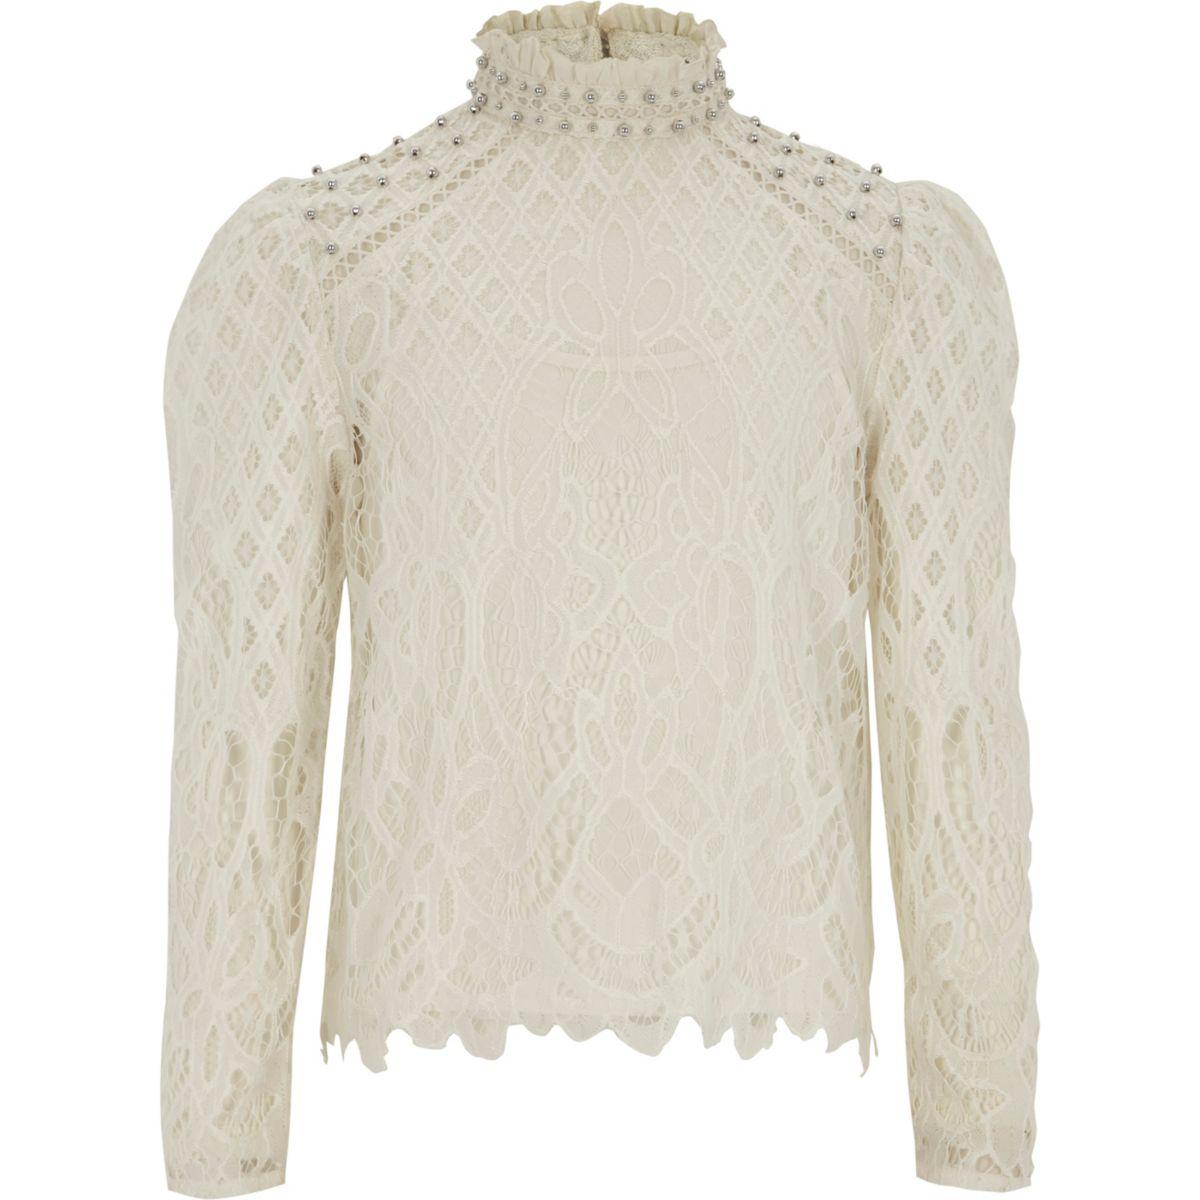 Girls cream lace high neck puff sleeve top